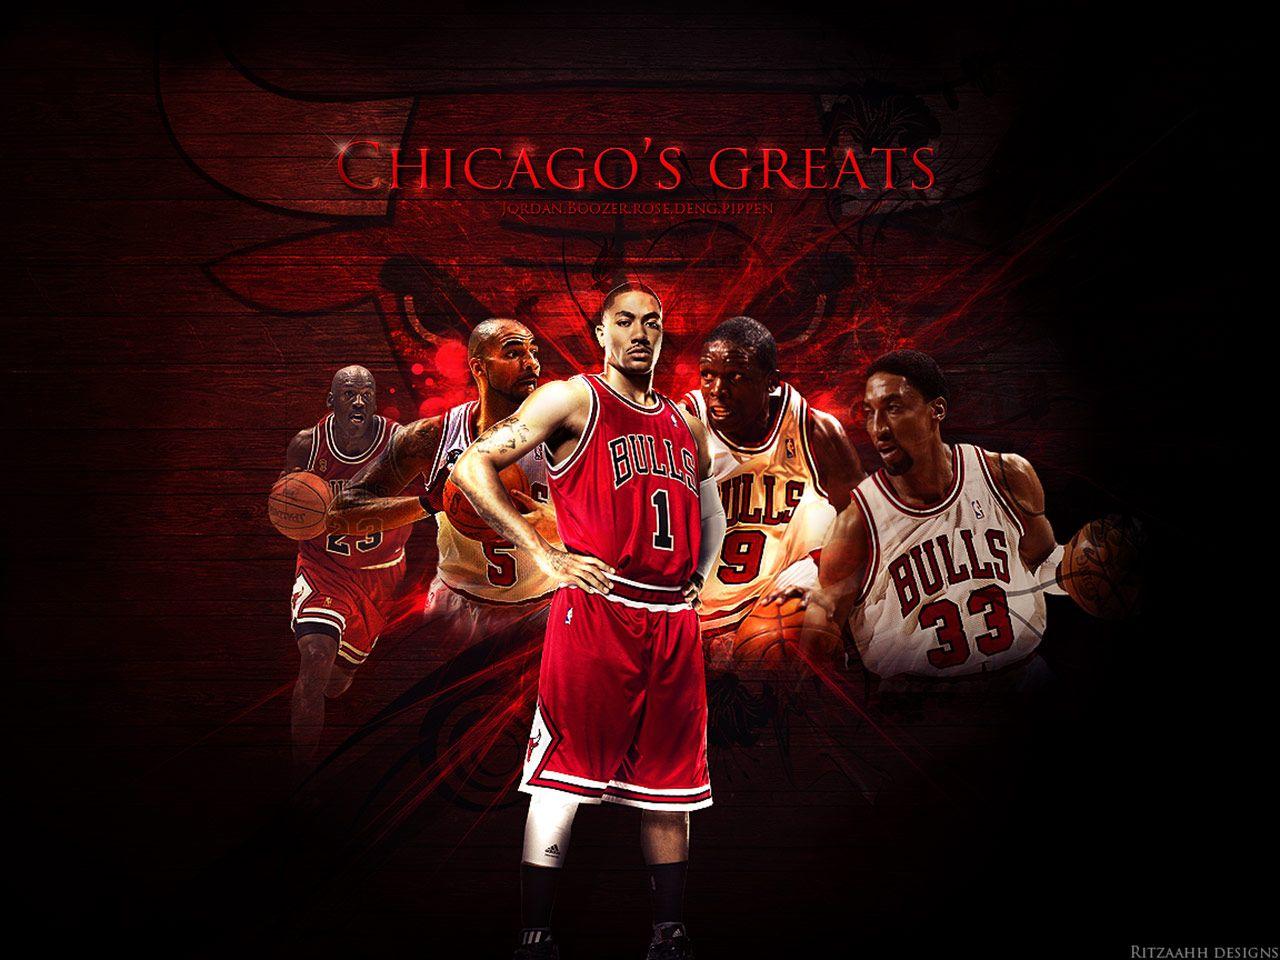 Chicago bulls fan chicago bulls fan pinterest chicago bulls chicago bulls fan voltagebd Images